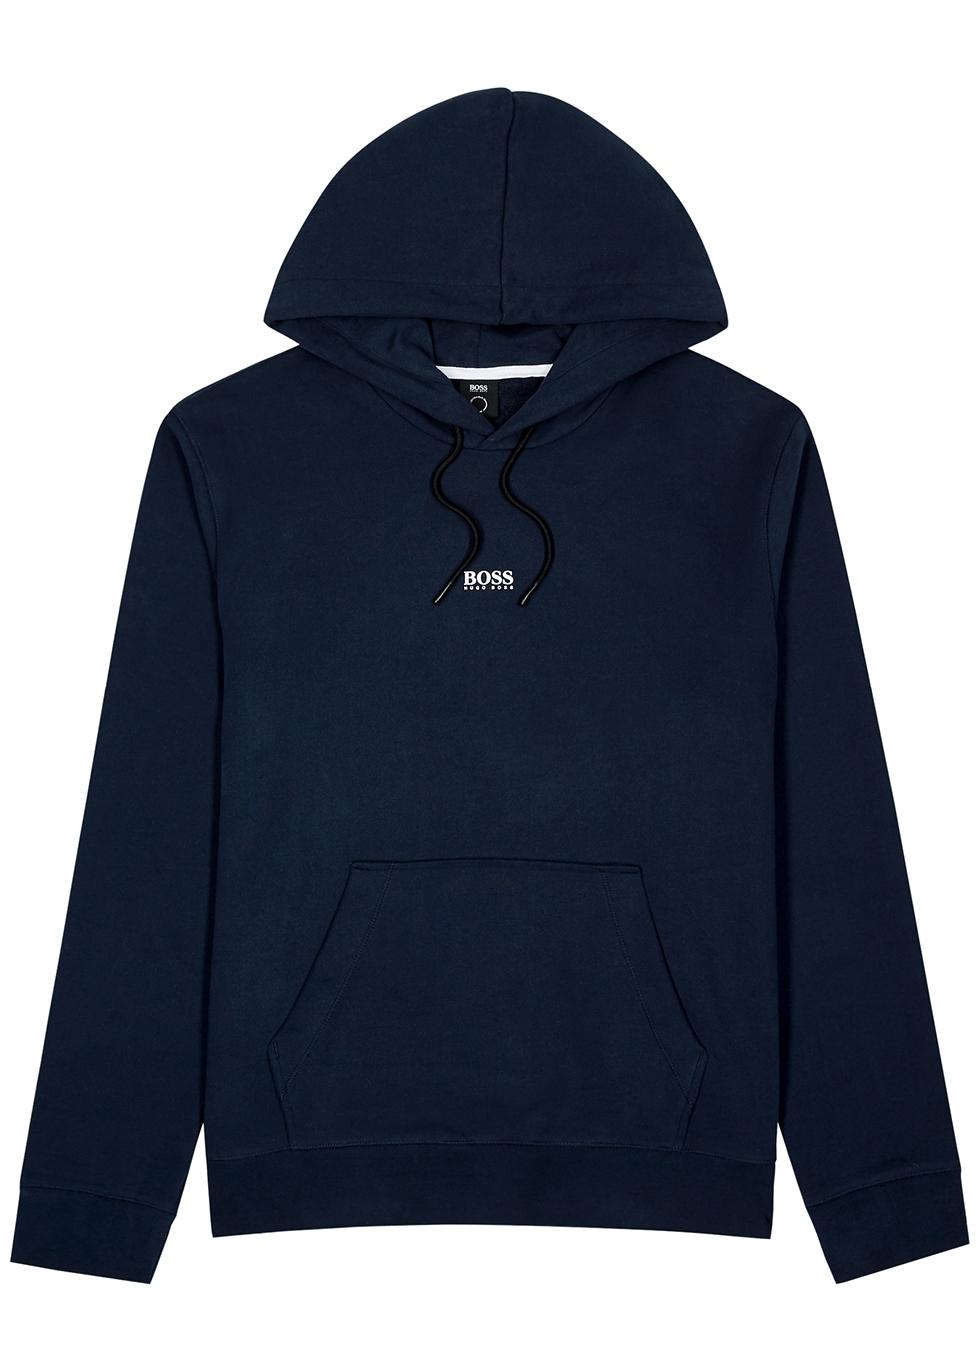 Weedo navy hooded cotton-blend sweatshirt